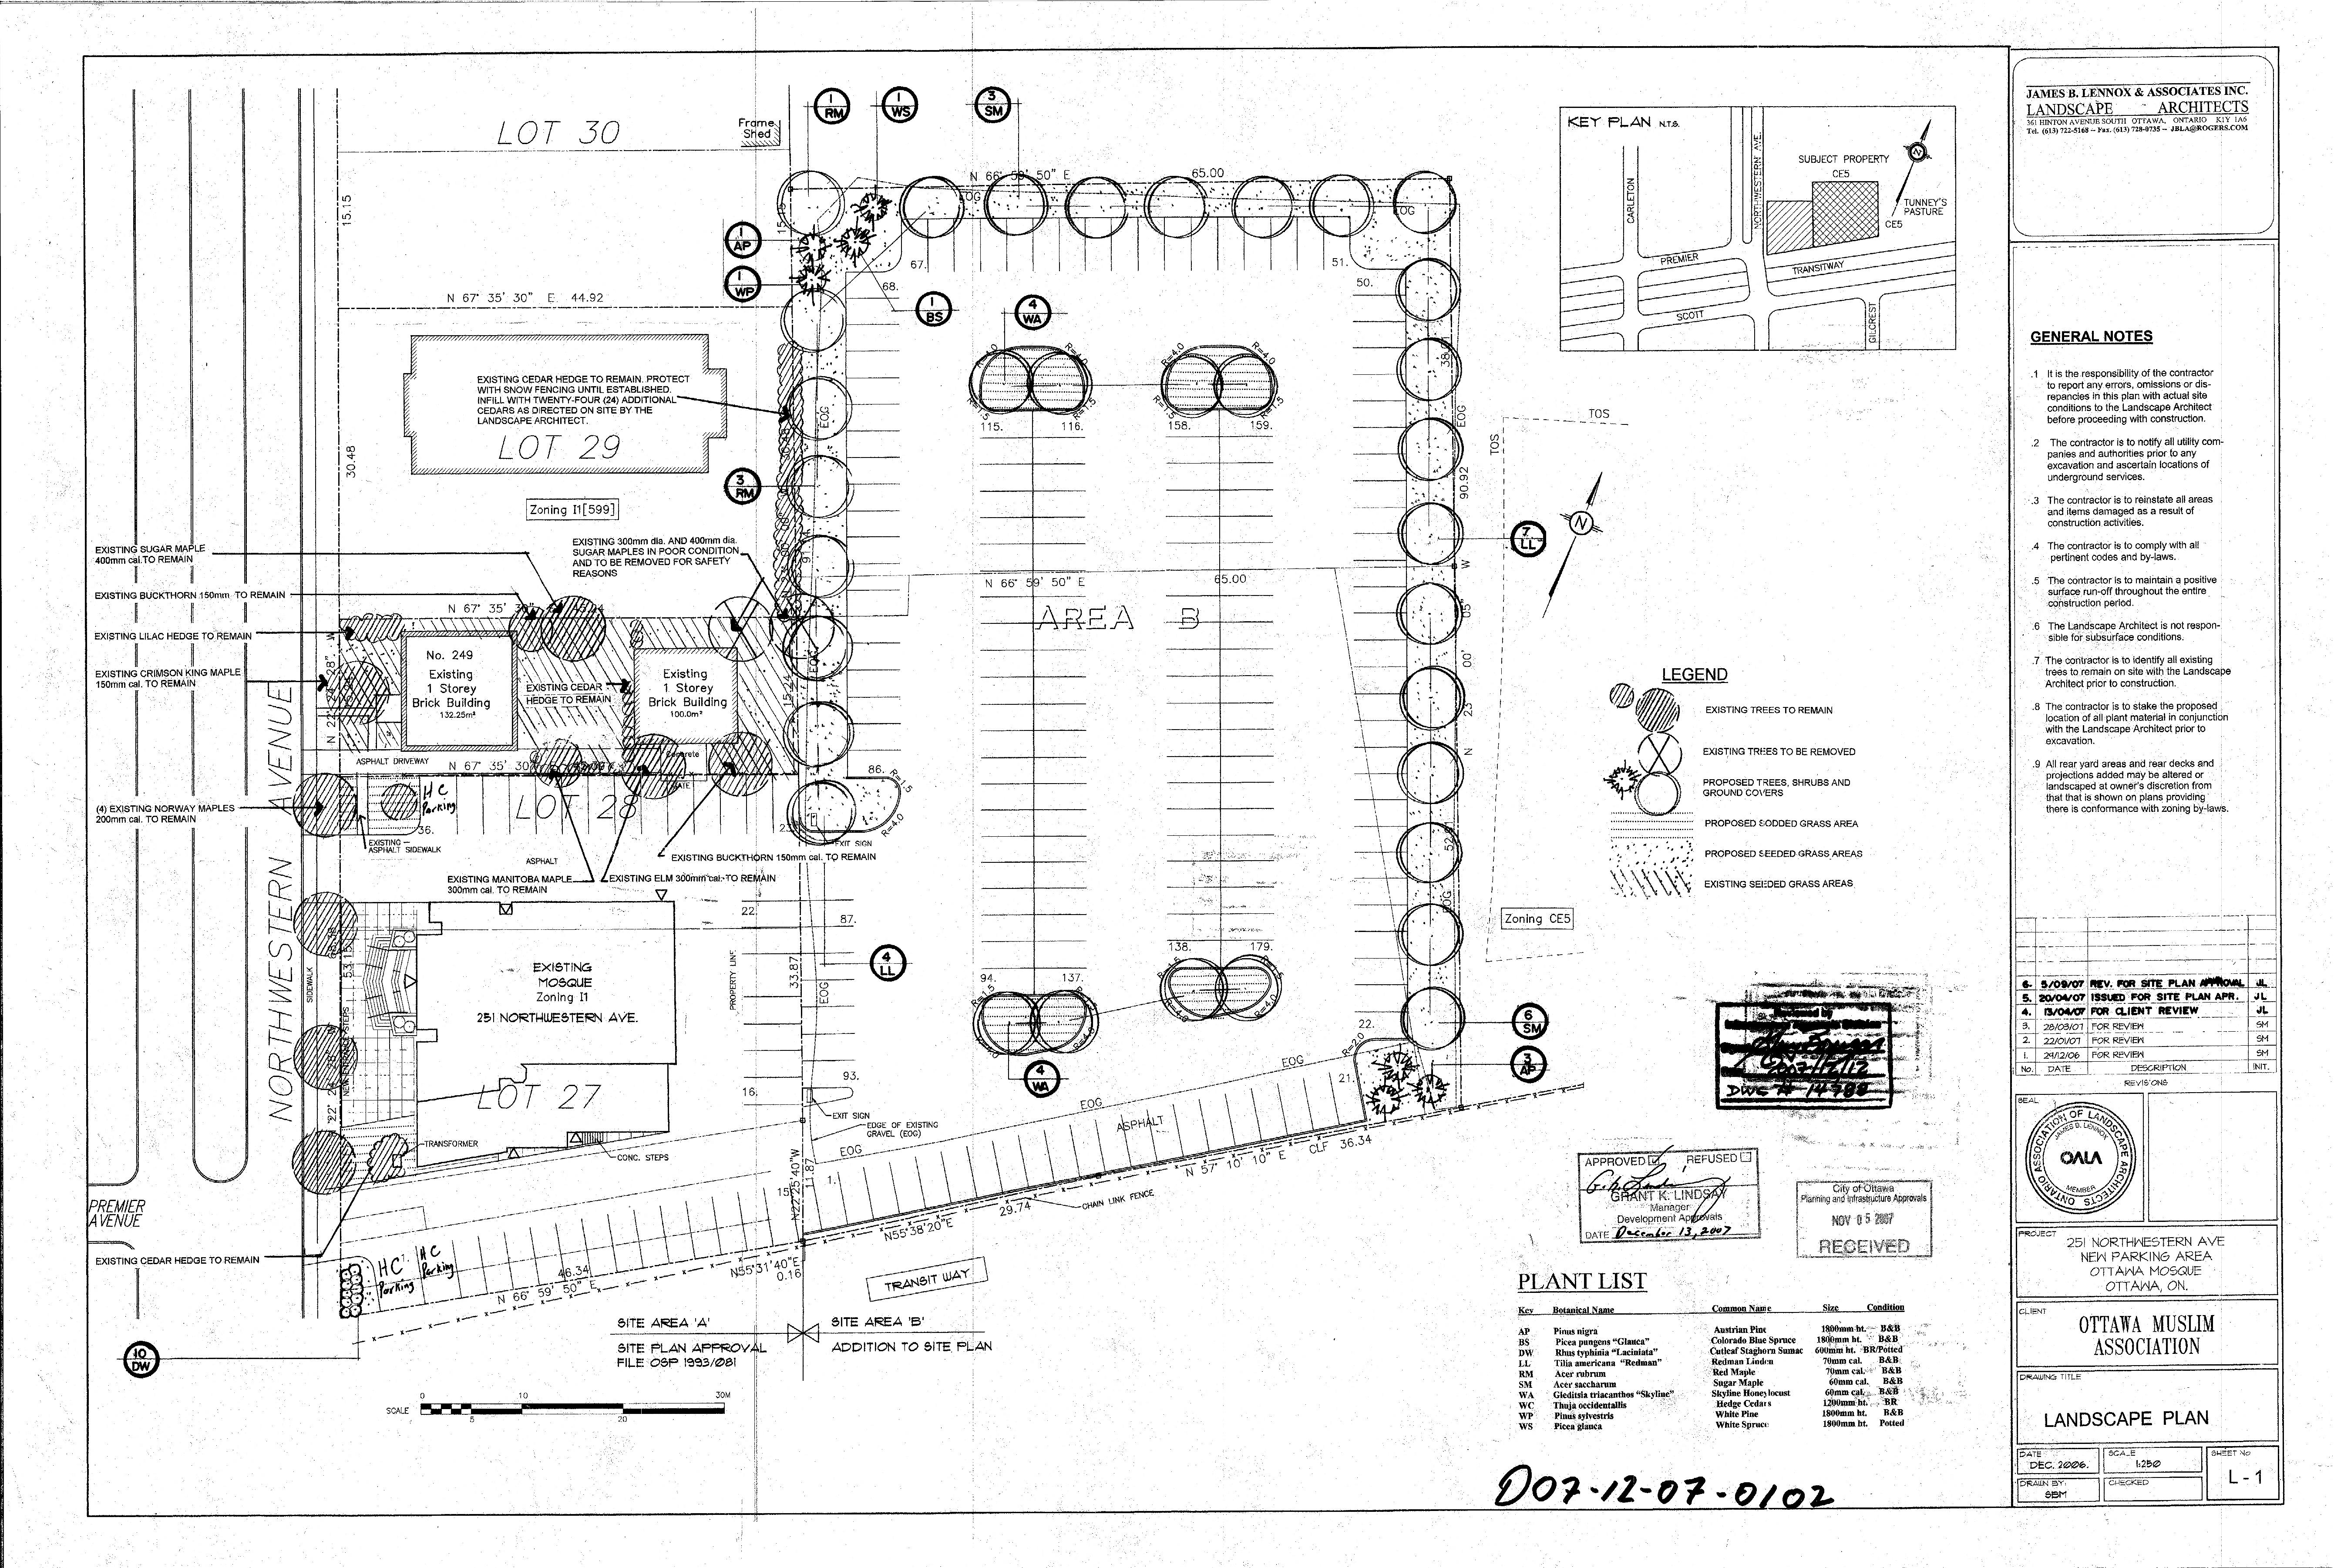 Ottawa Mosque Site And Landscape Plans